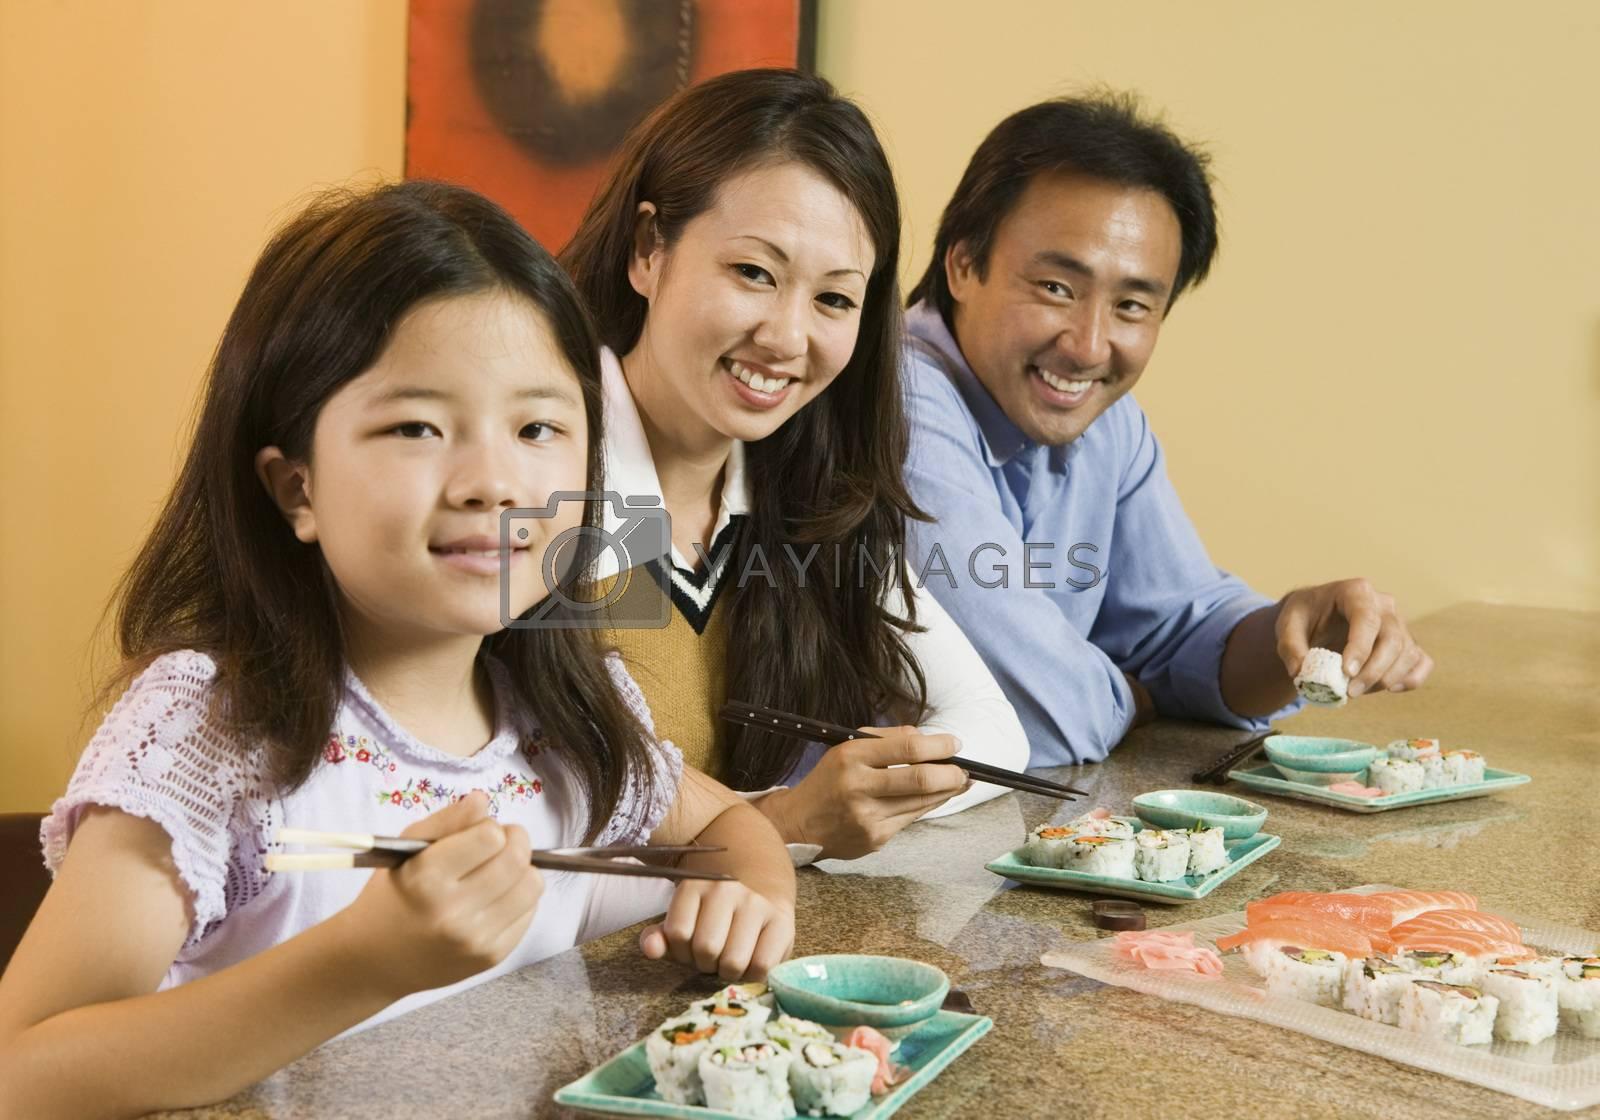 Family Eating Sushi Together portrait